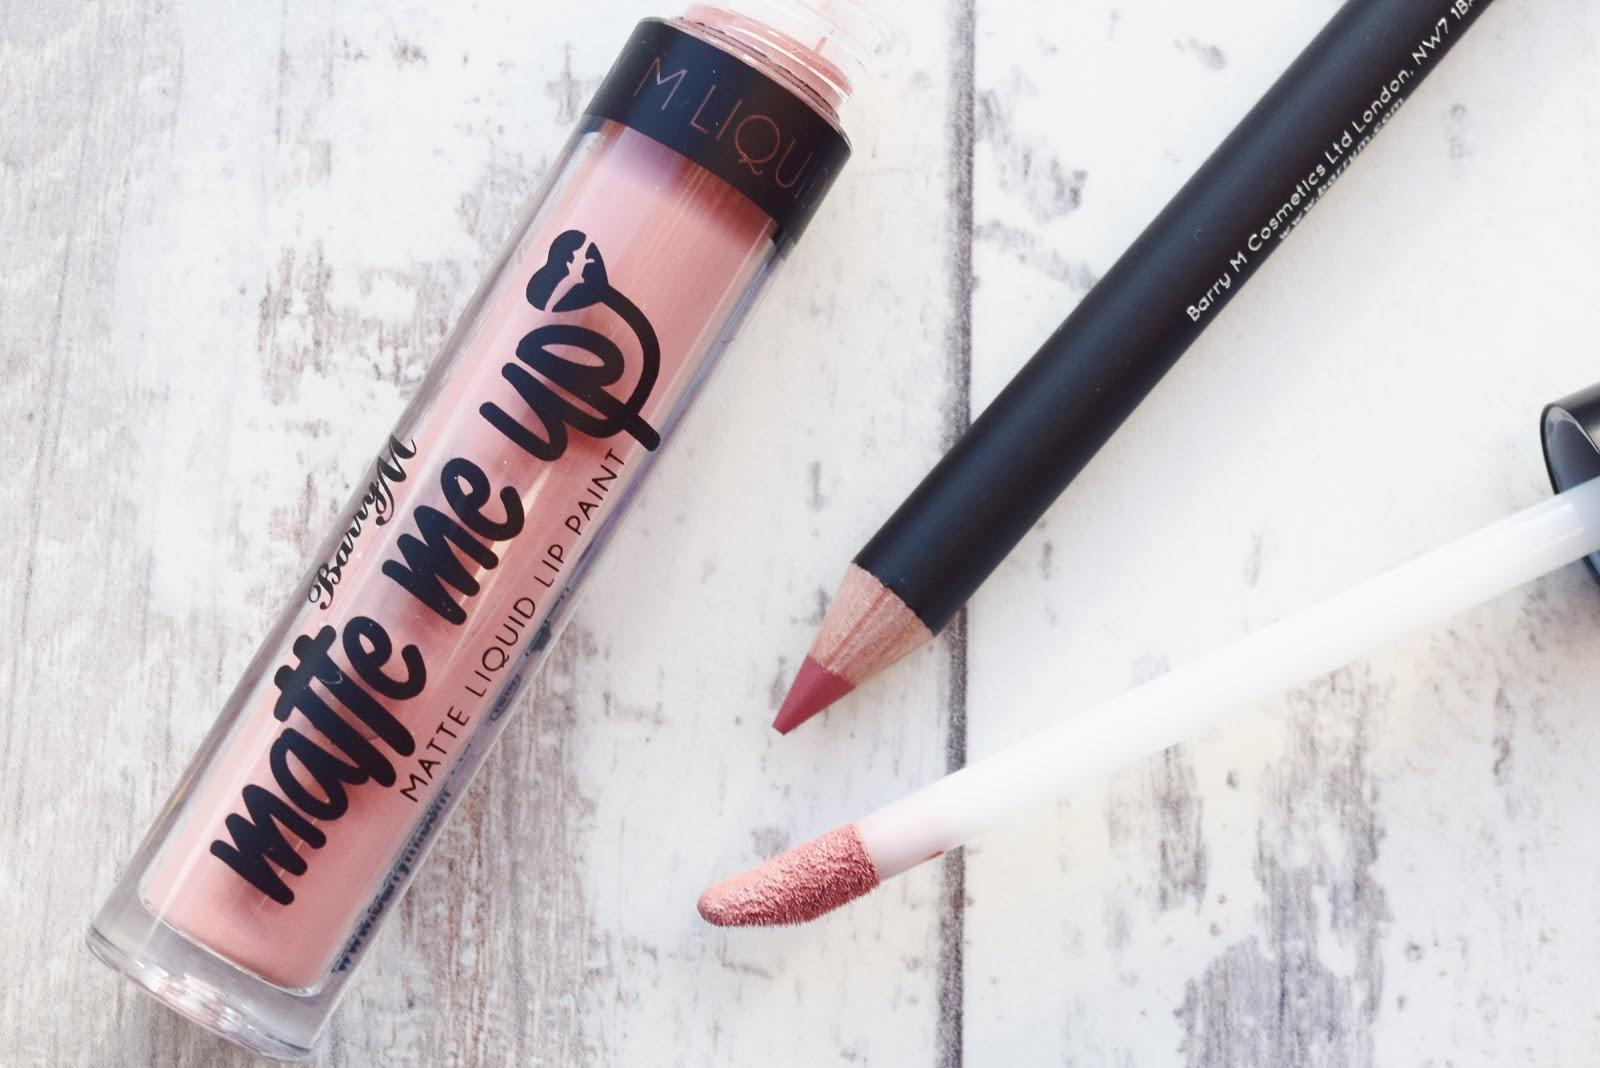 Barry M Matte Me Up Lip Kit Doll 27.6g - Feelunique